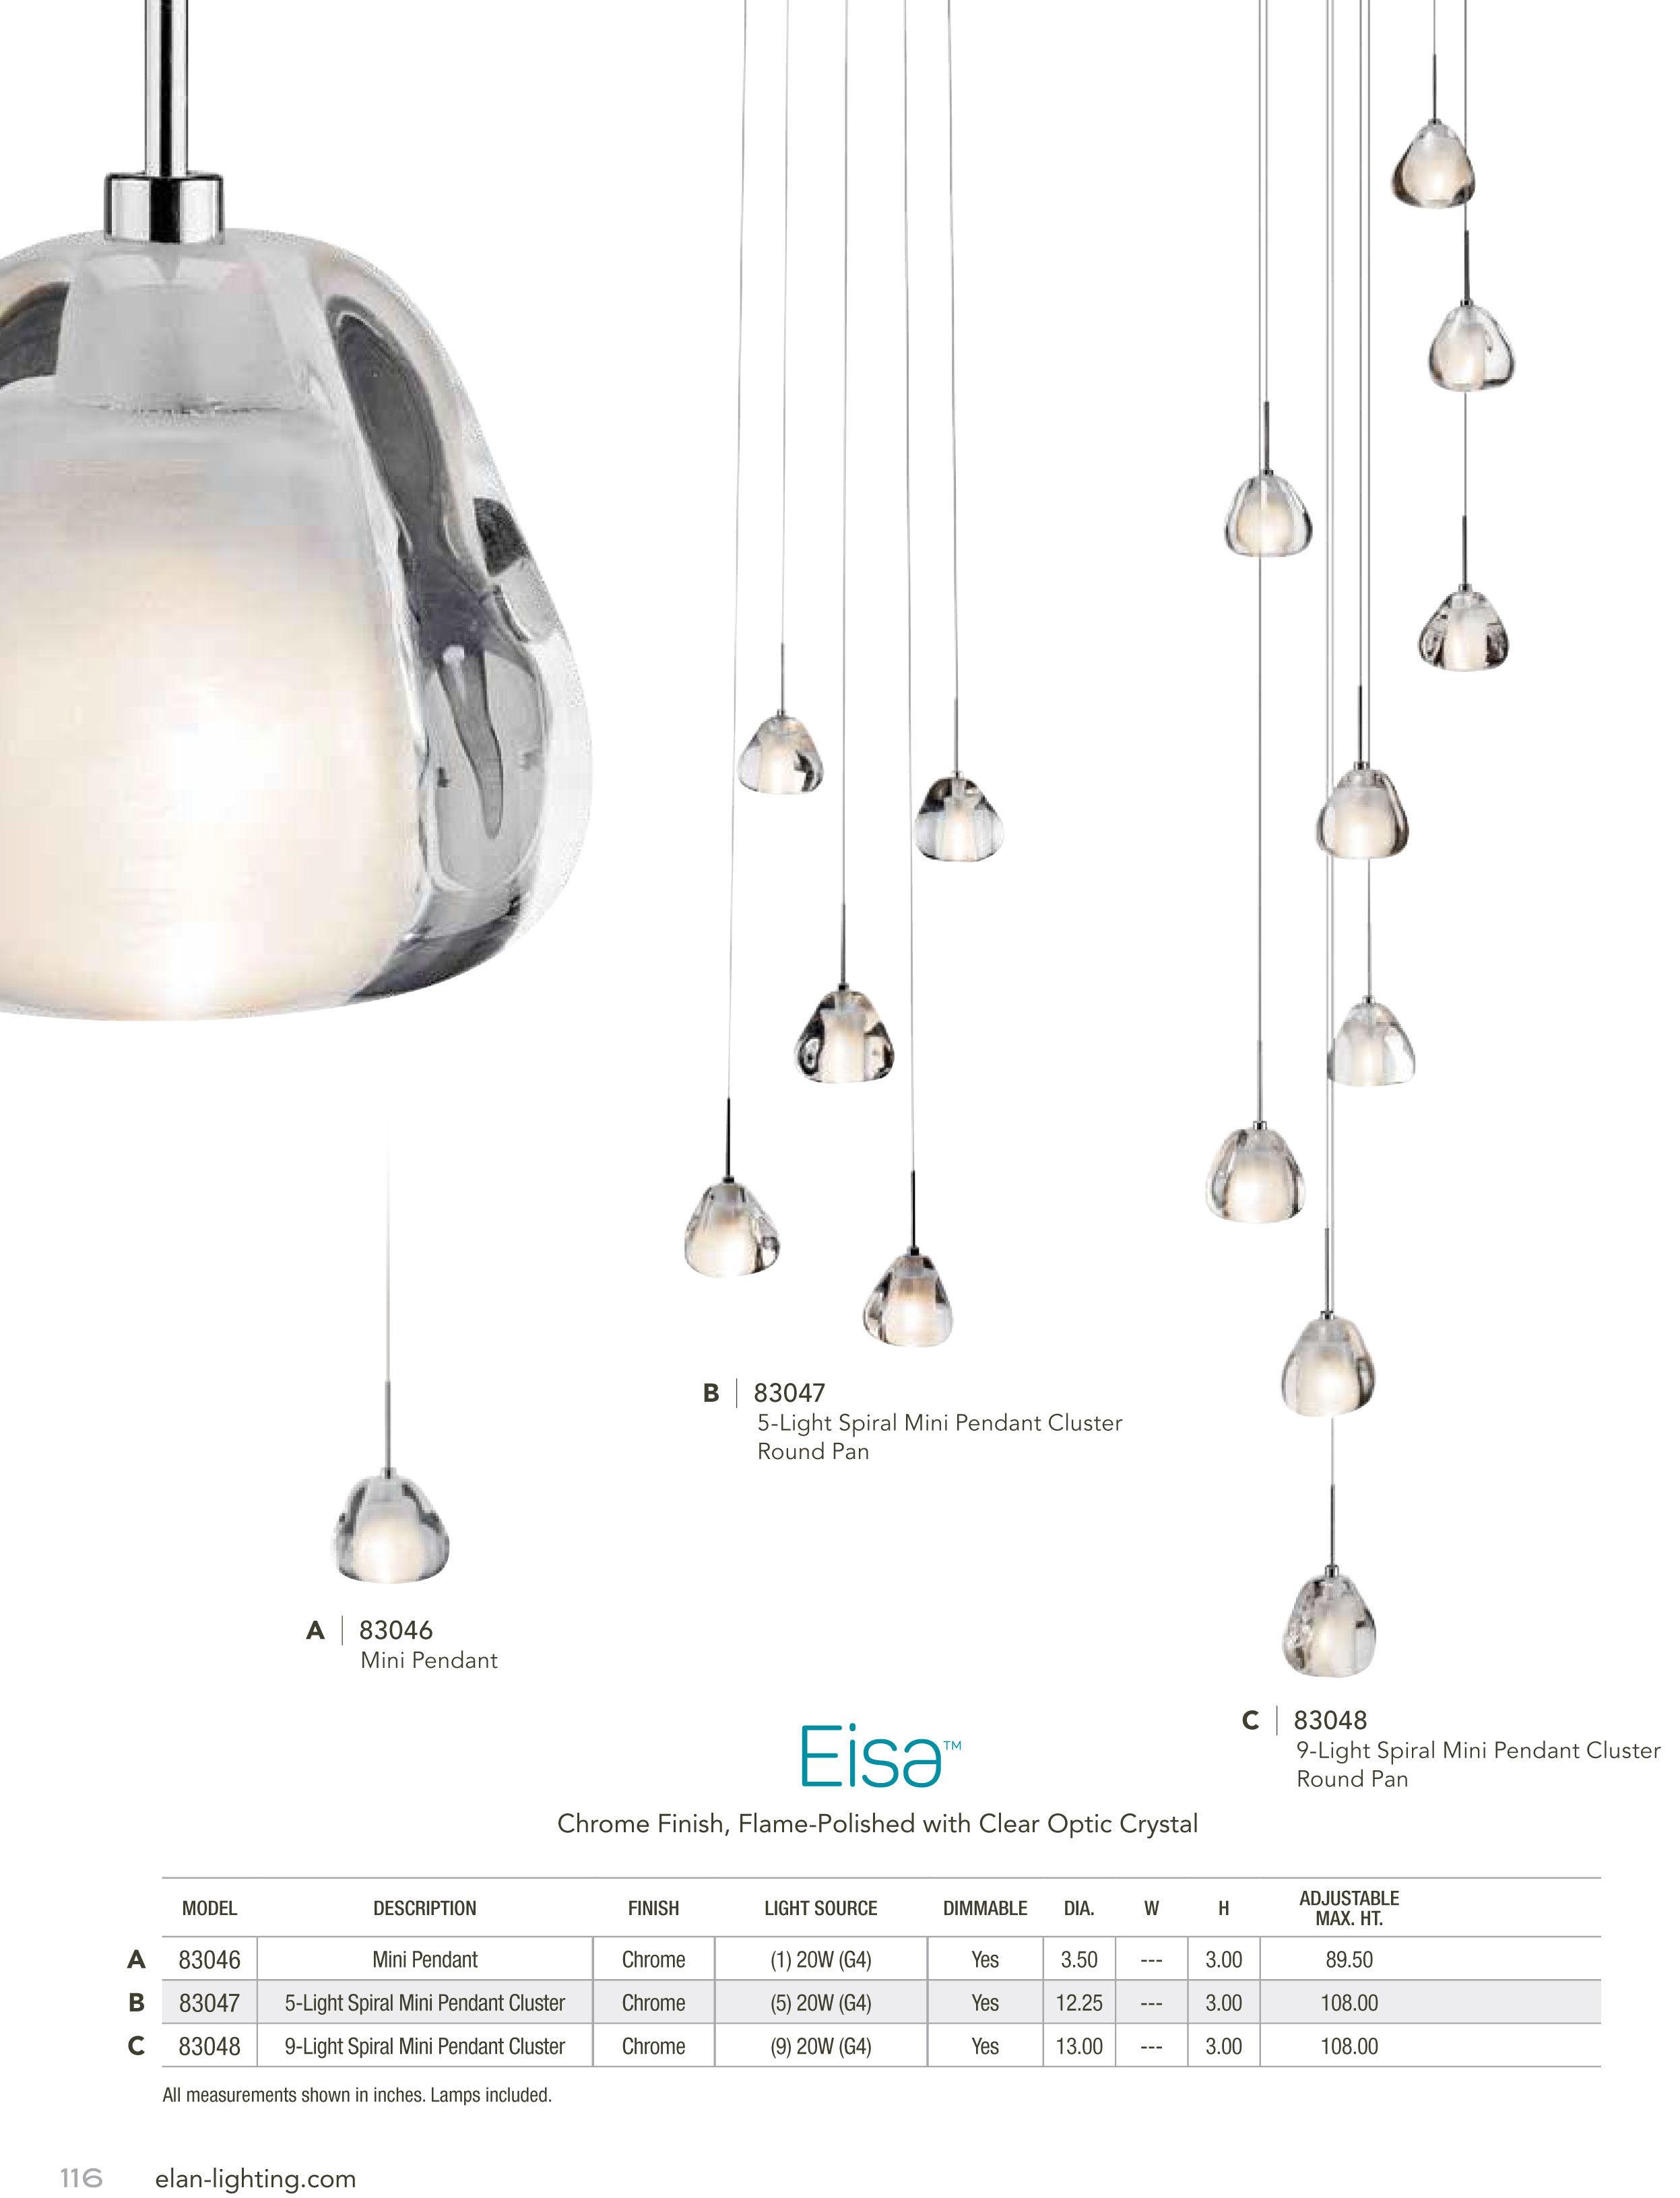 model elan products lighting maze